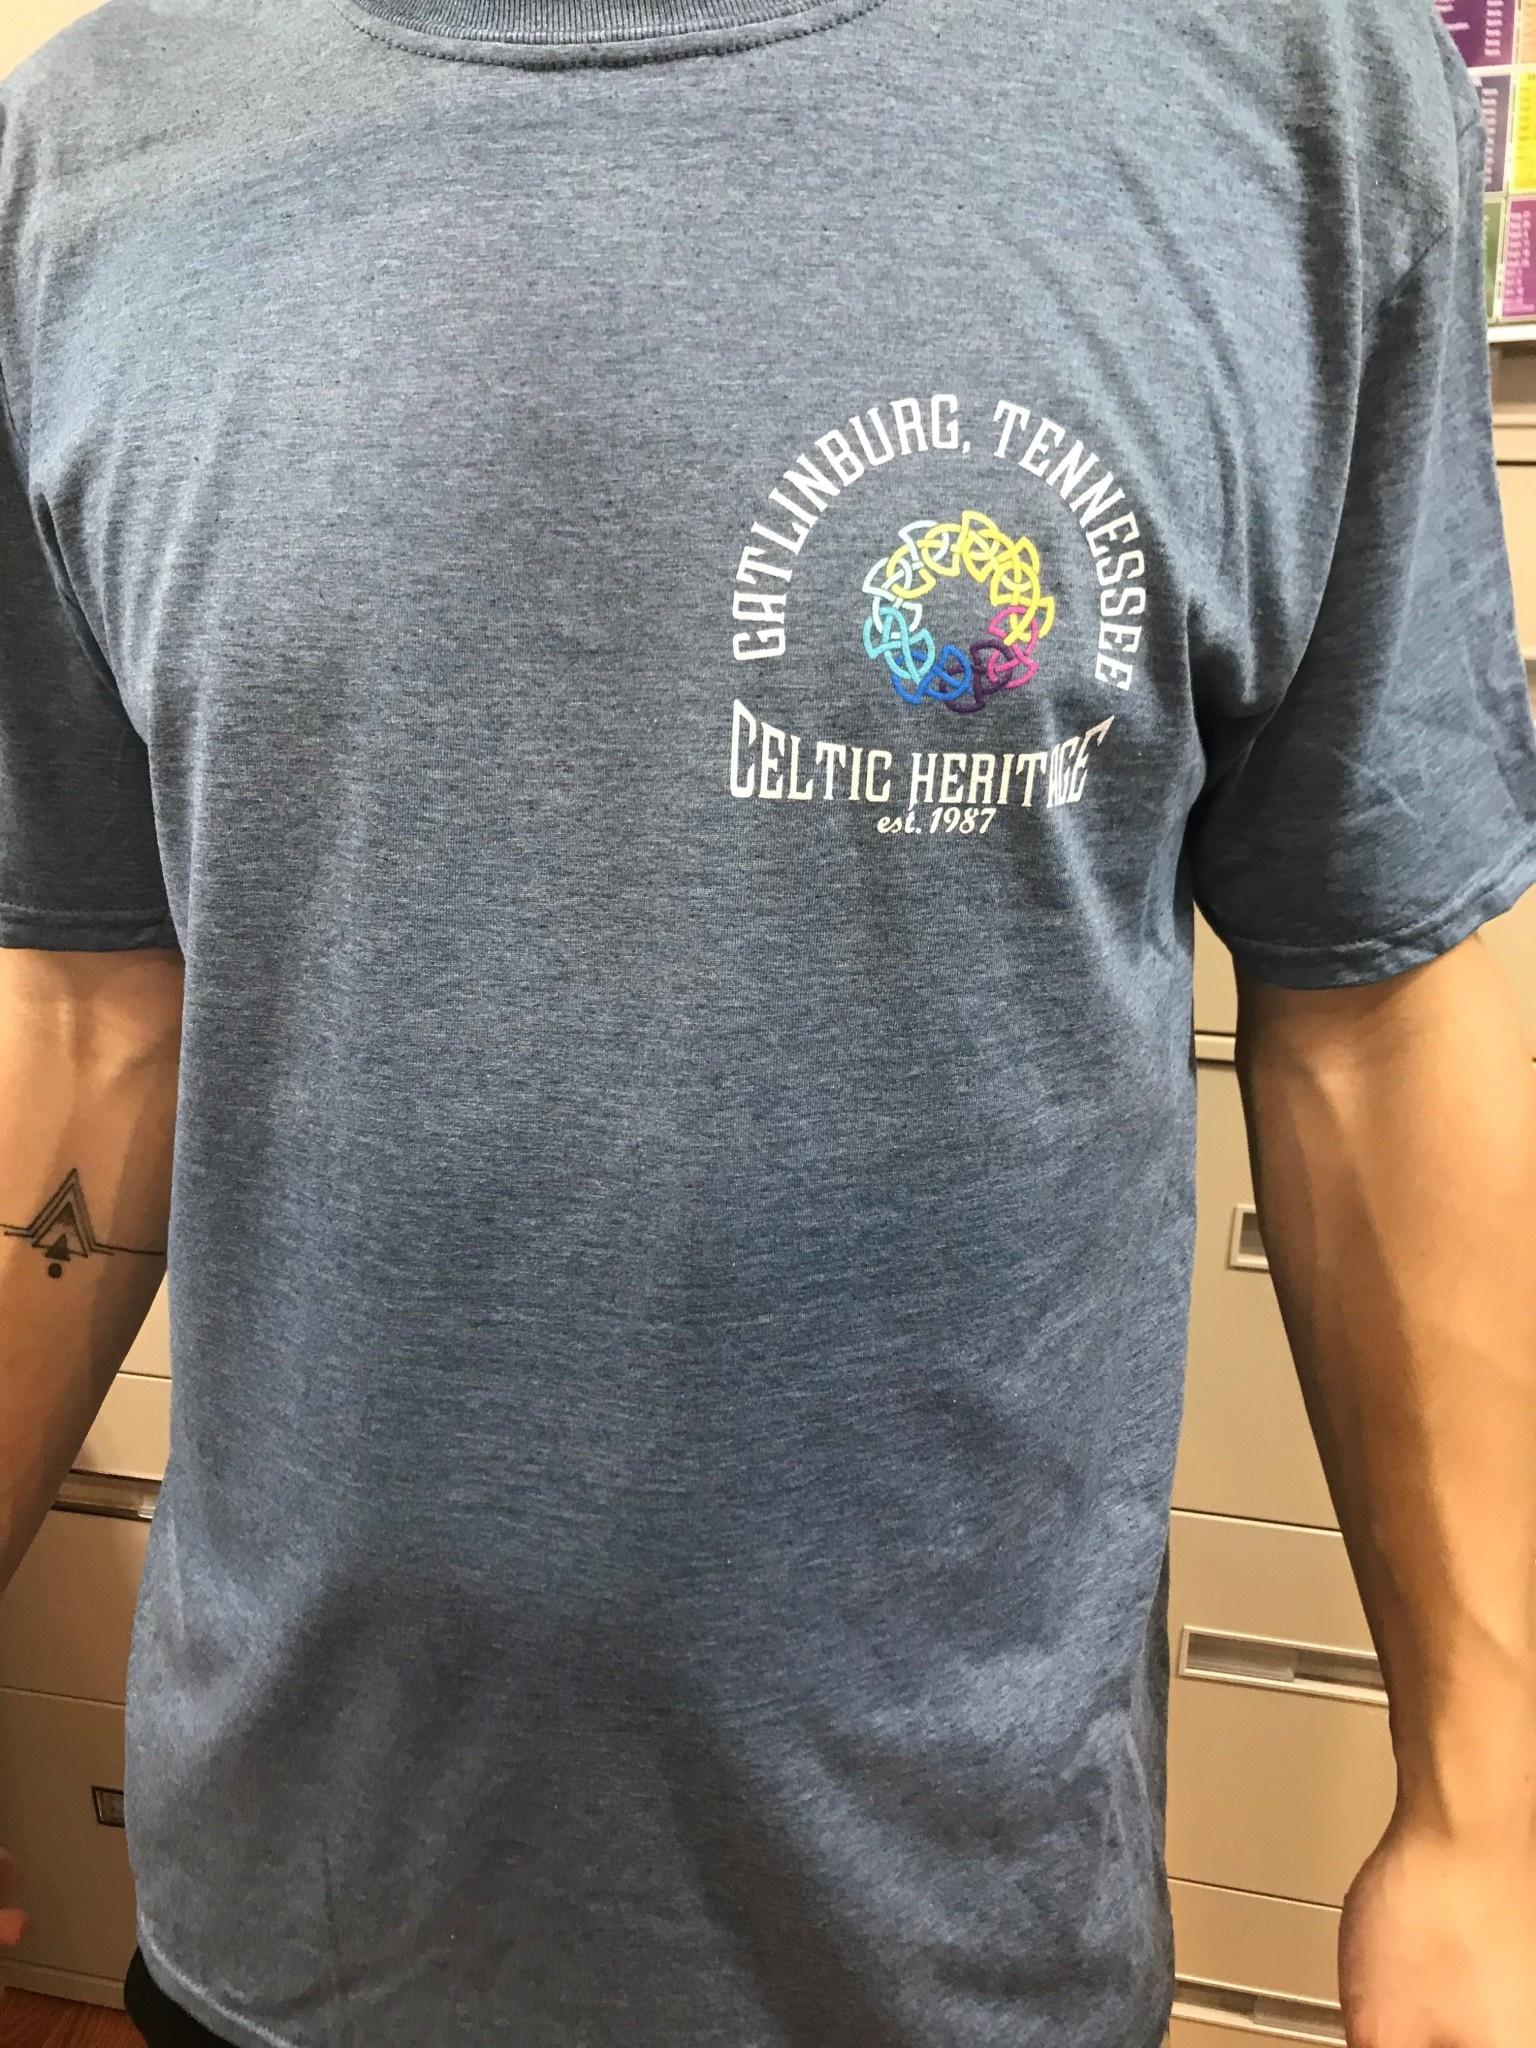 Shirt: Men Celt Nations